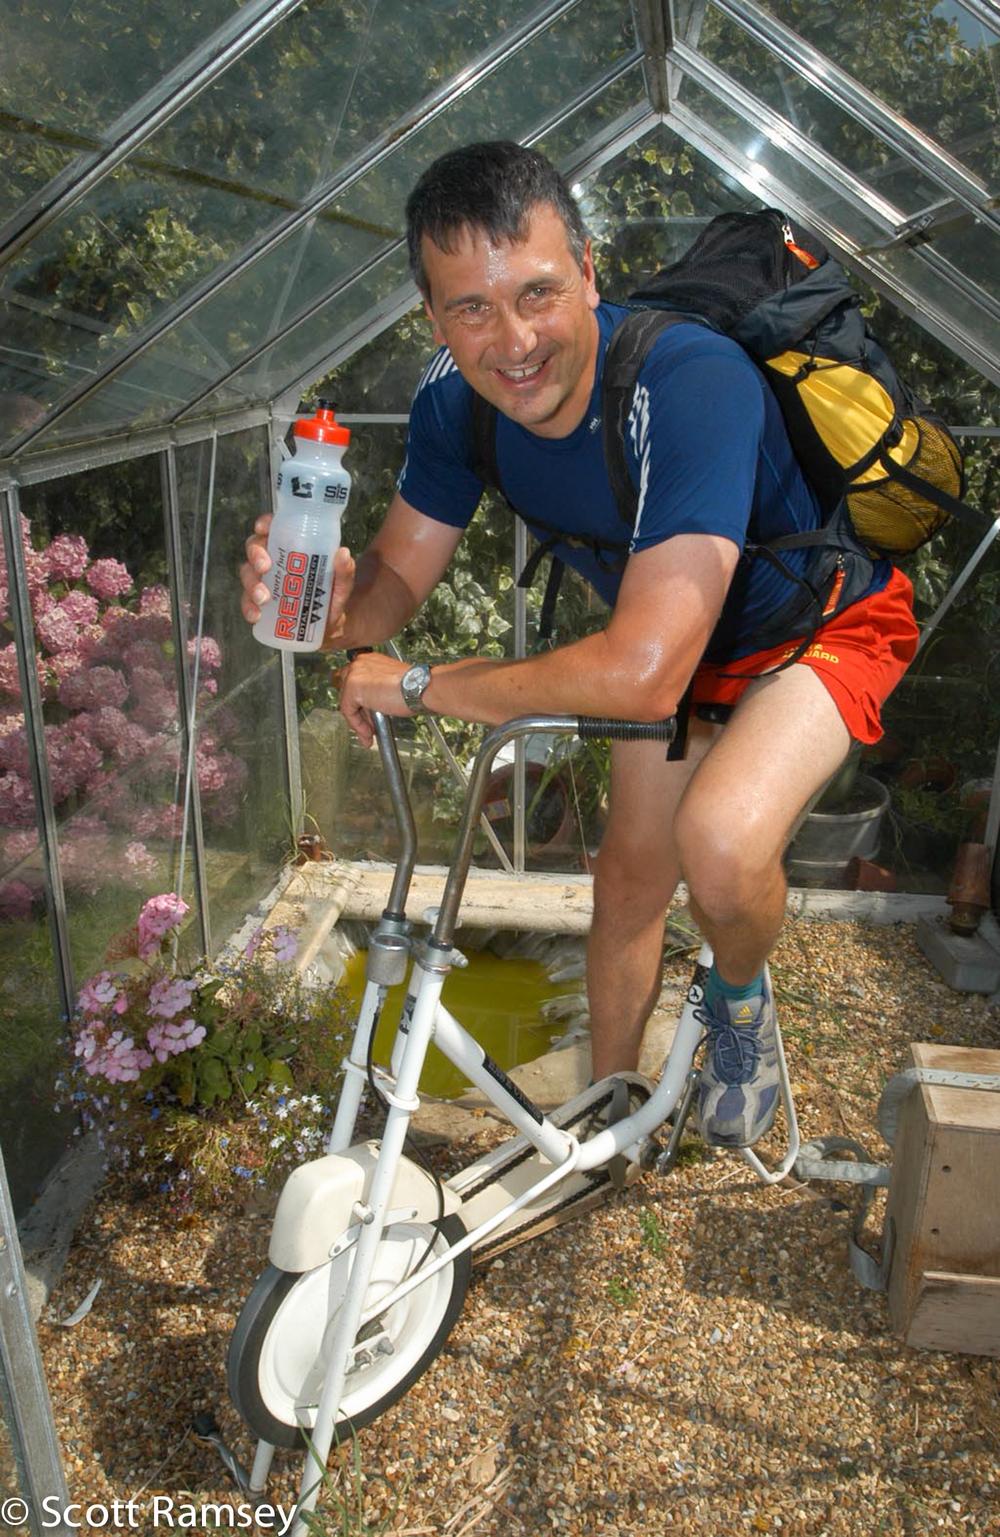 Marathon Training In Greenhouse